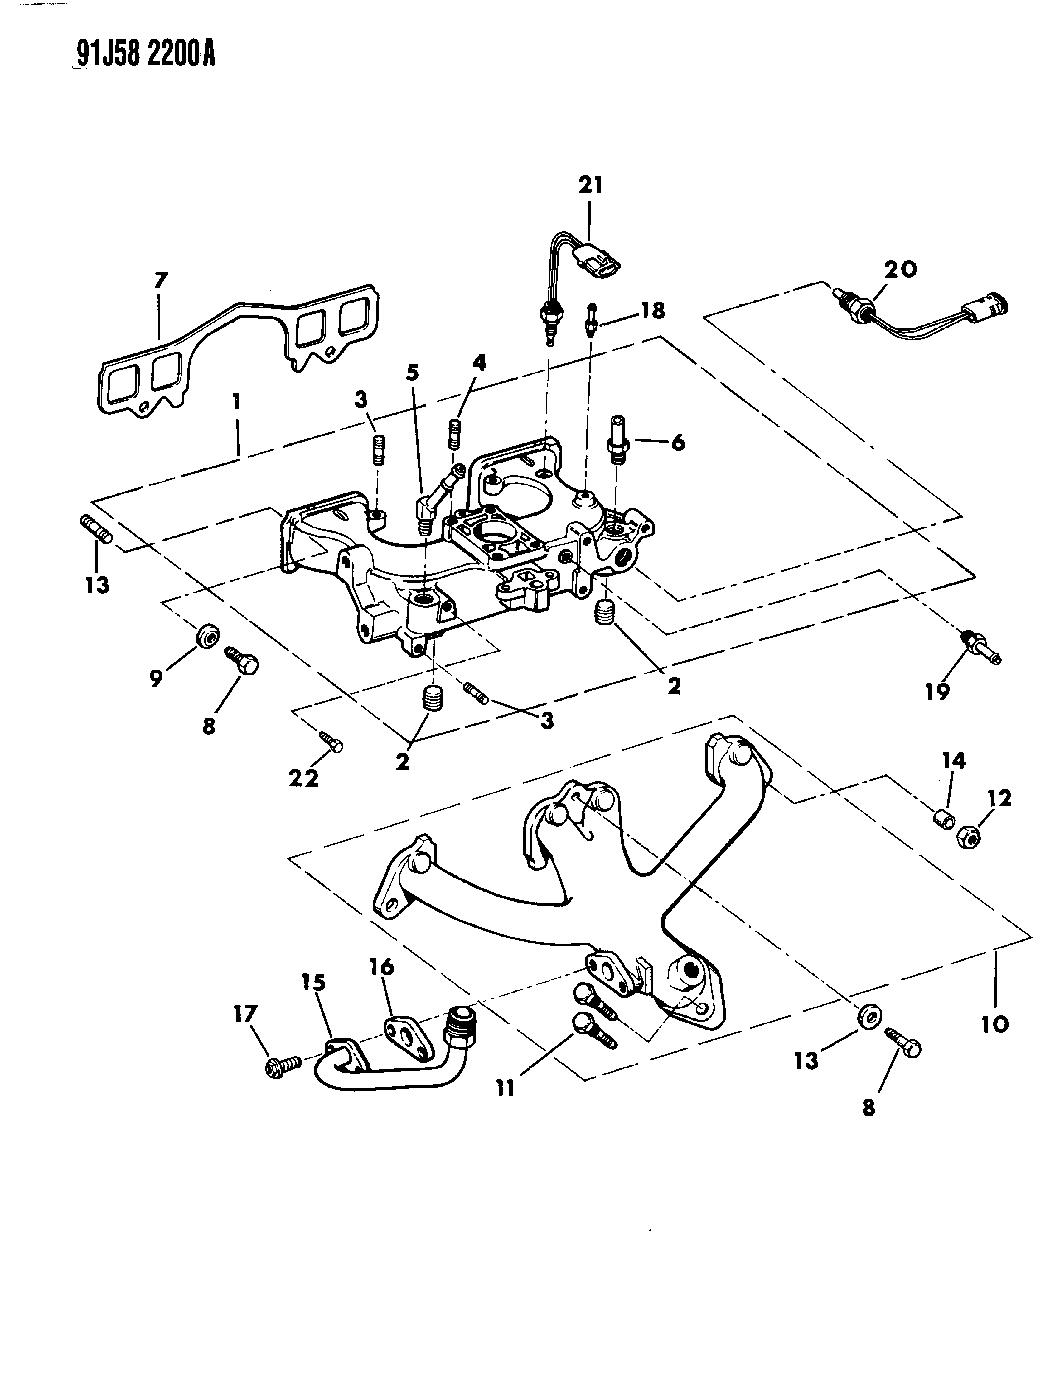 1991 Jeep Comanche Manifold - Intake & Exhaust - Thumbnail 2